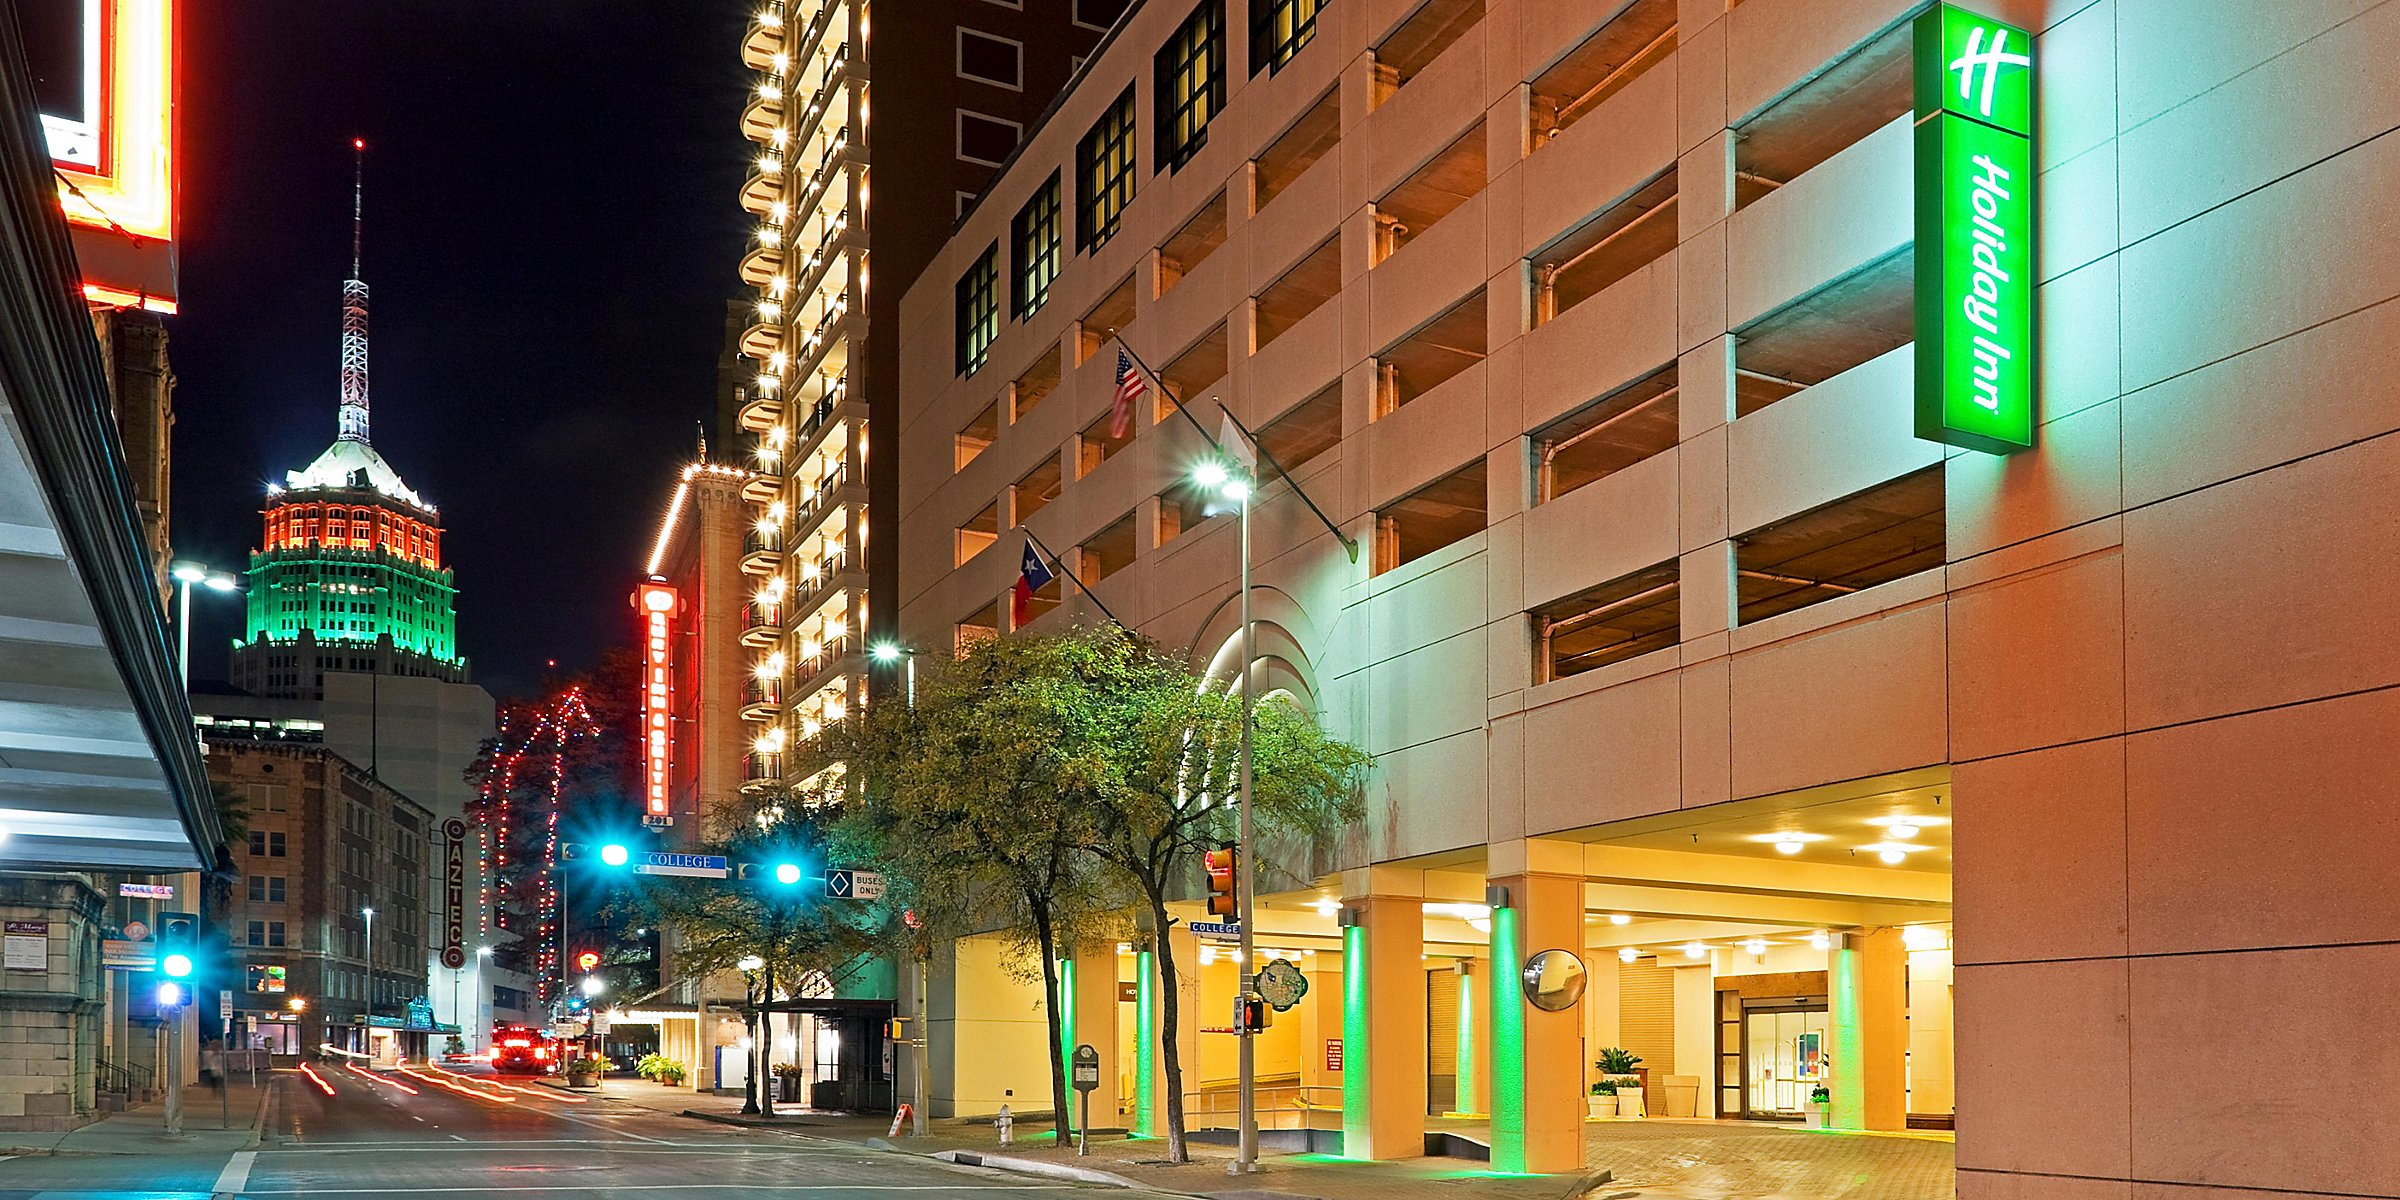 Holiday Inn San Antonio Riverwalk Hotel | Book Direct & Save